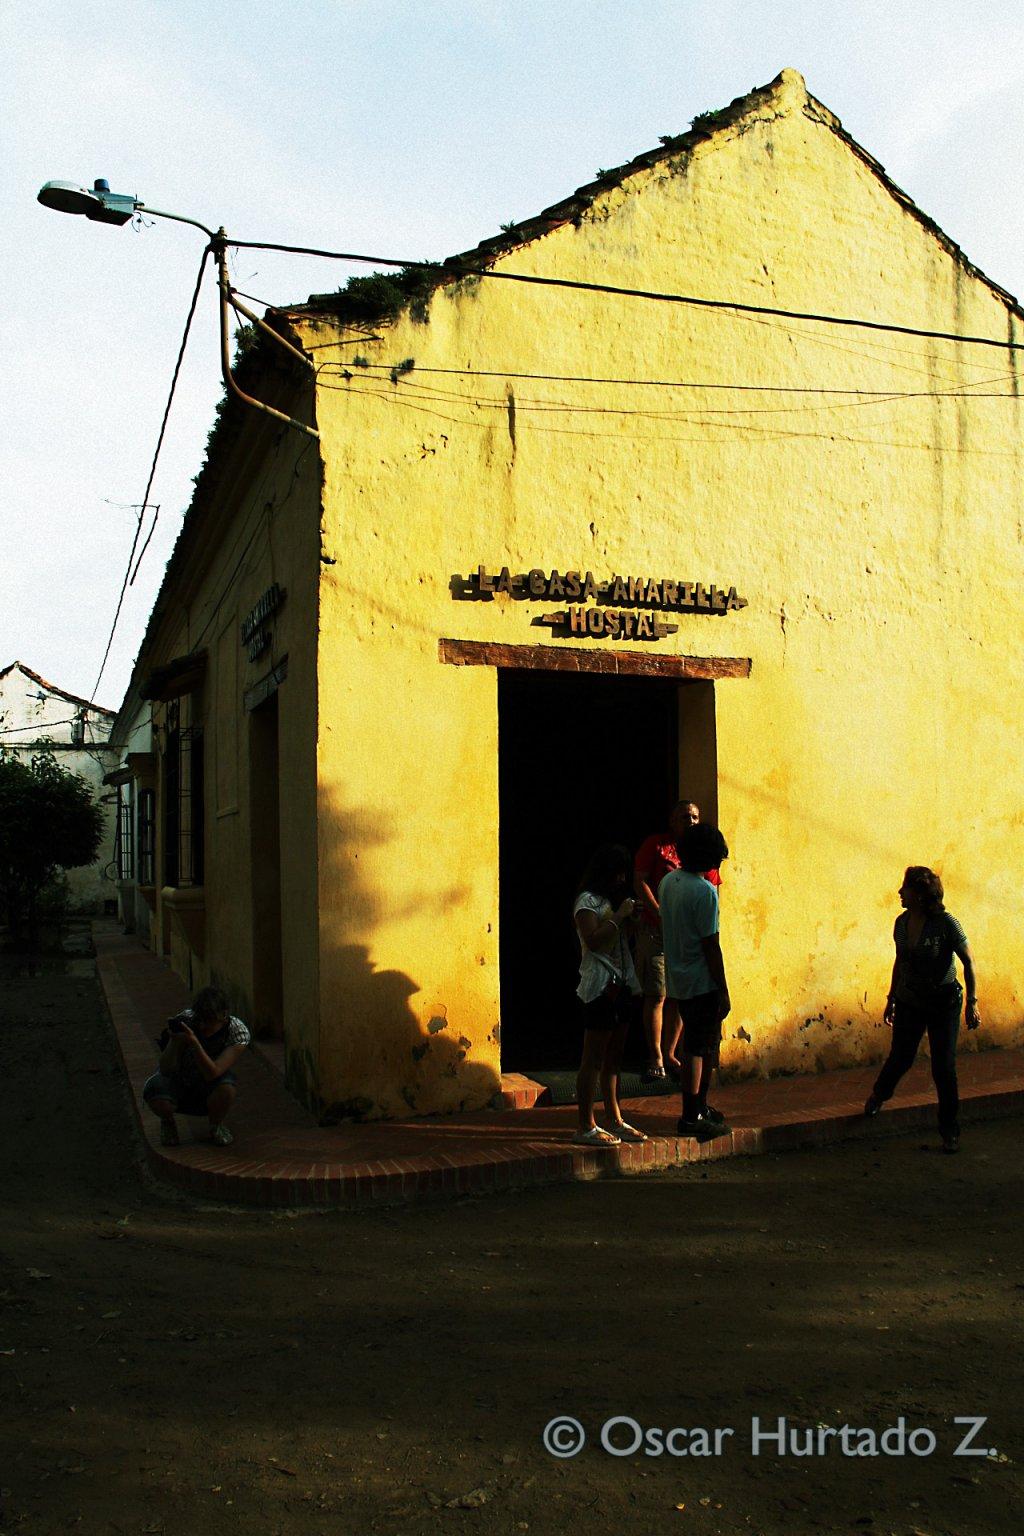 The entrance to La Casa Amarilla Hostel in Mompox